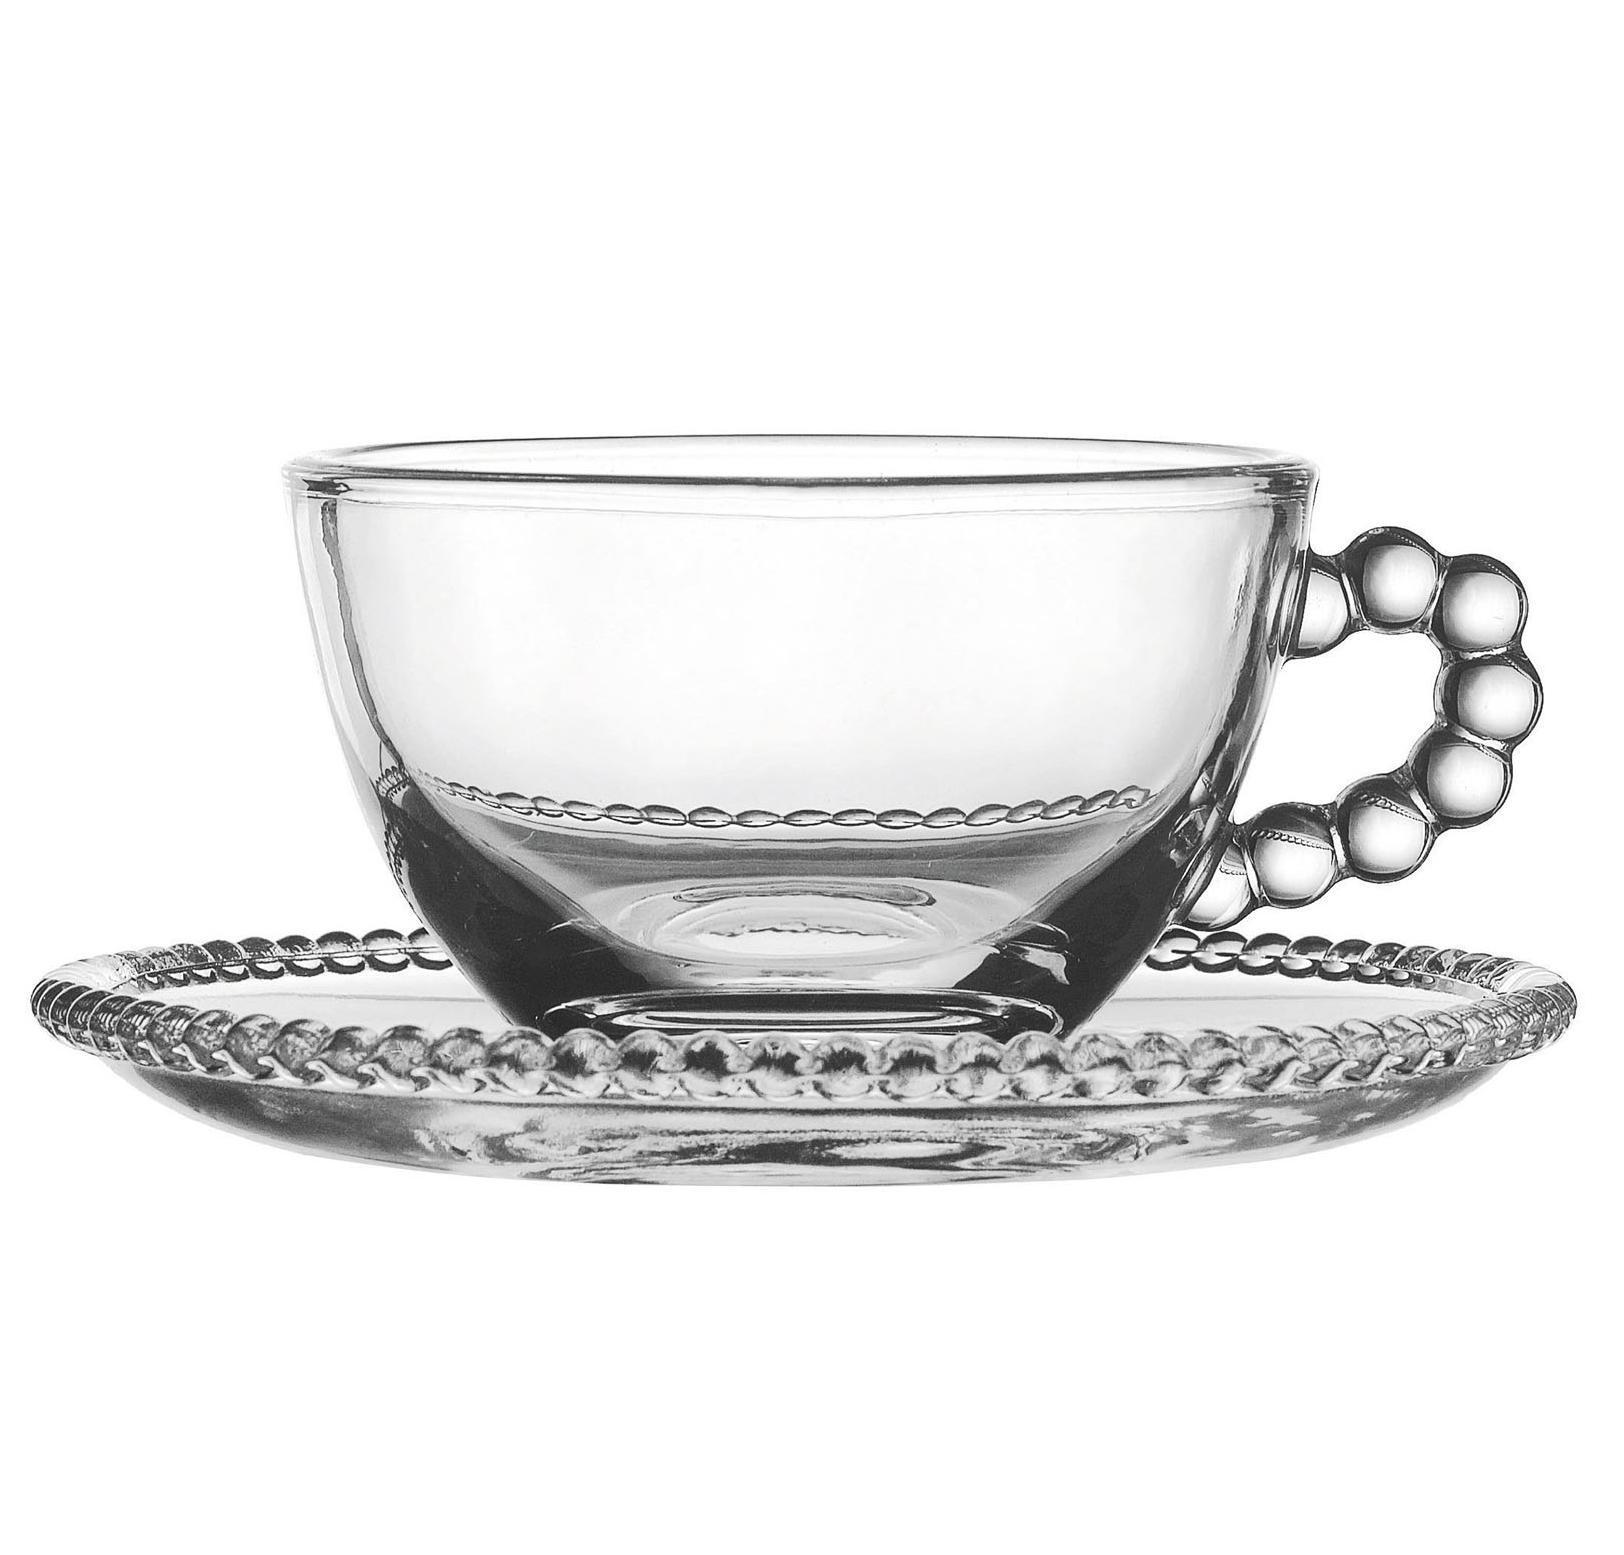 CÔTÉ TABLE Skleněný šálek s podšálkem Pearl, čirá barva, sklo